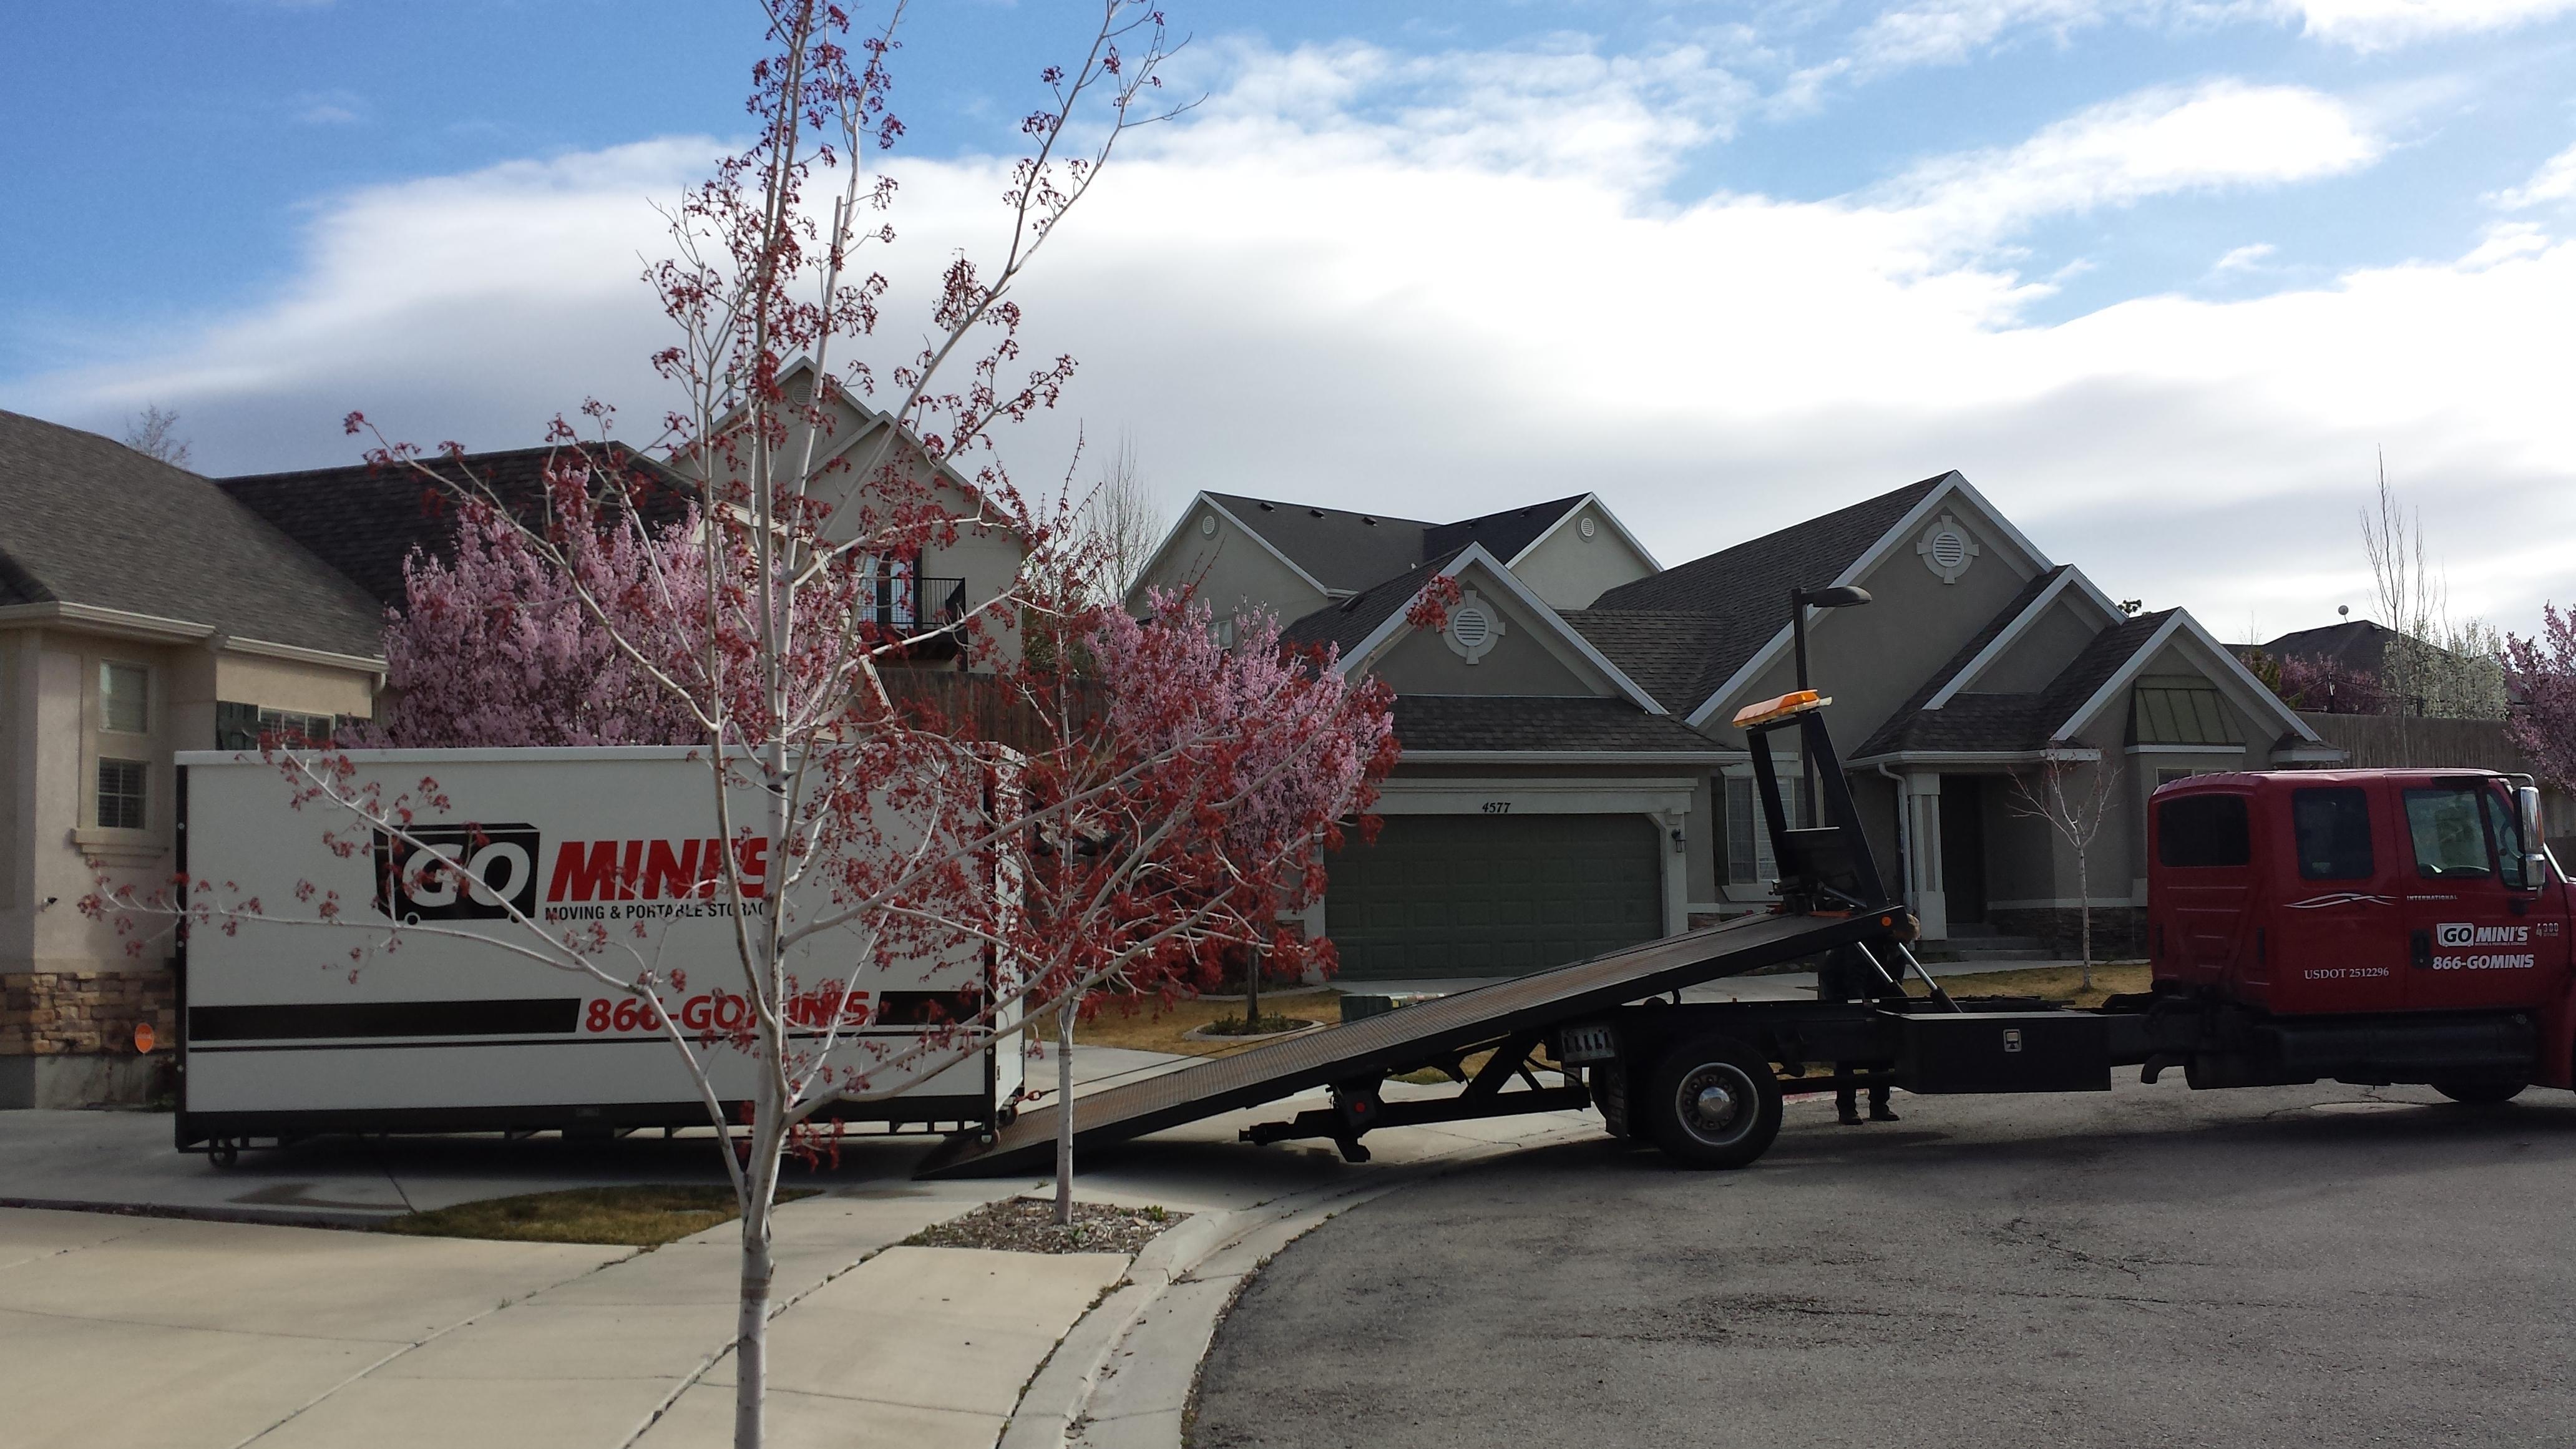 Go Mini's Moving & Portable Storage image 6